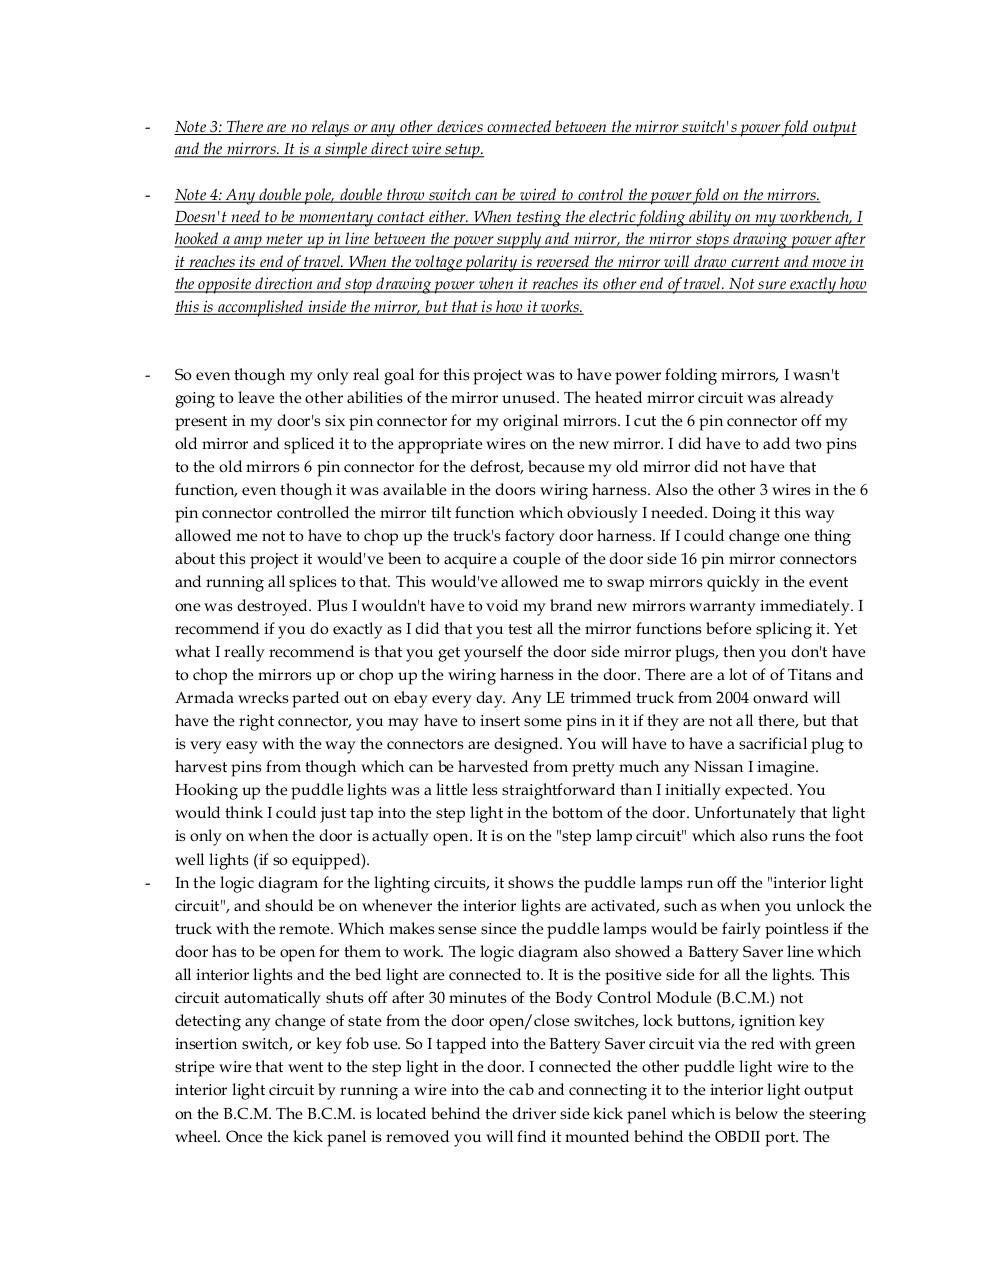 Document1 by I808666 - NISSAN TITAN POWER FOLDING MIRROR INSTALL ...